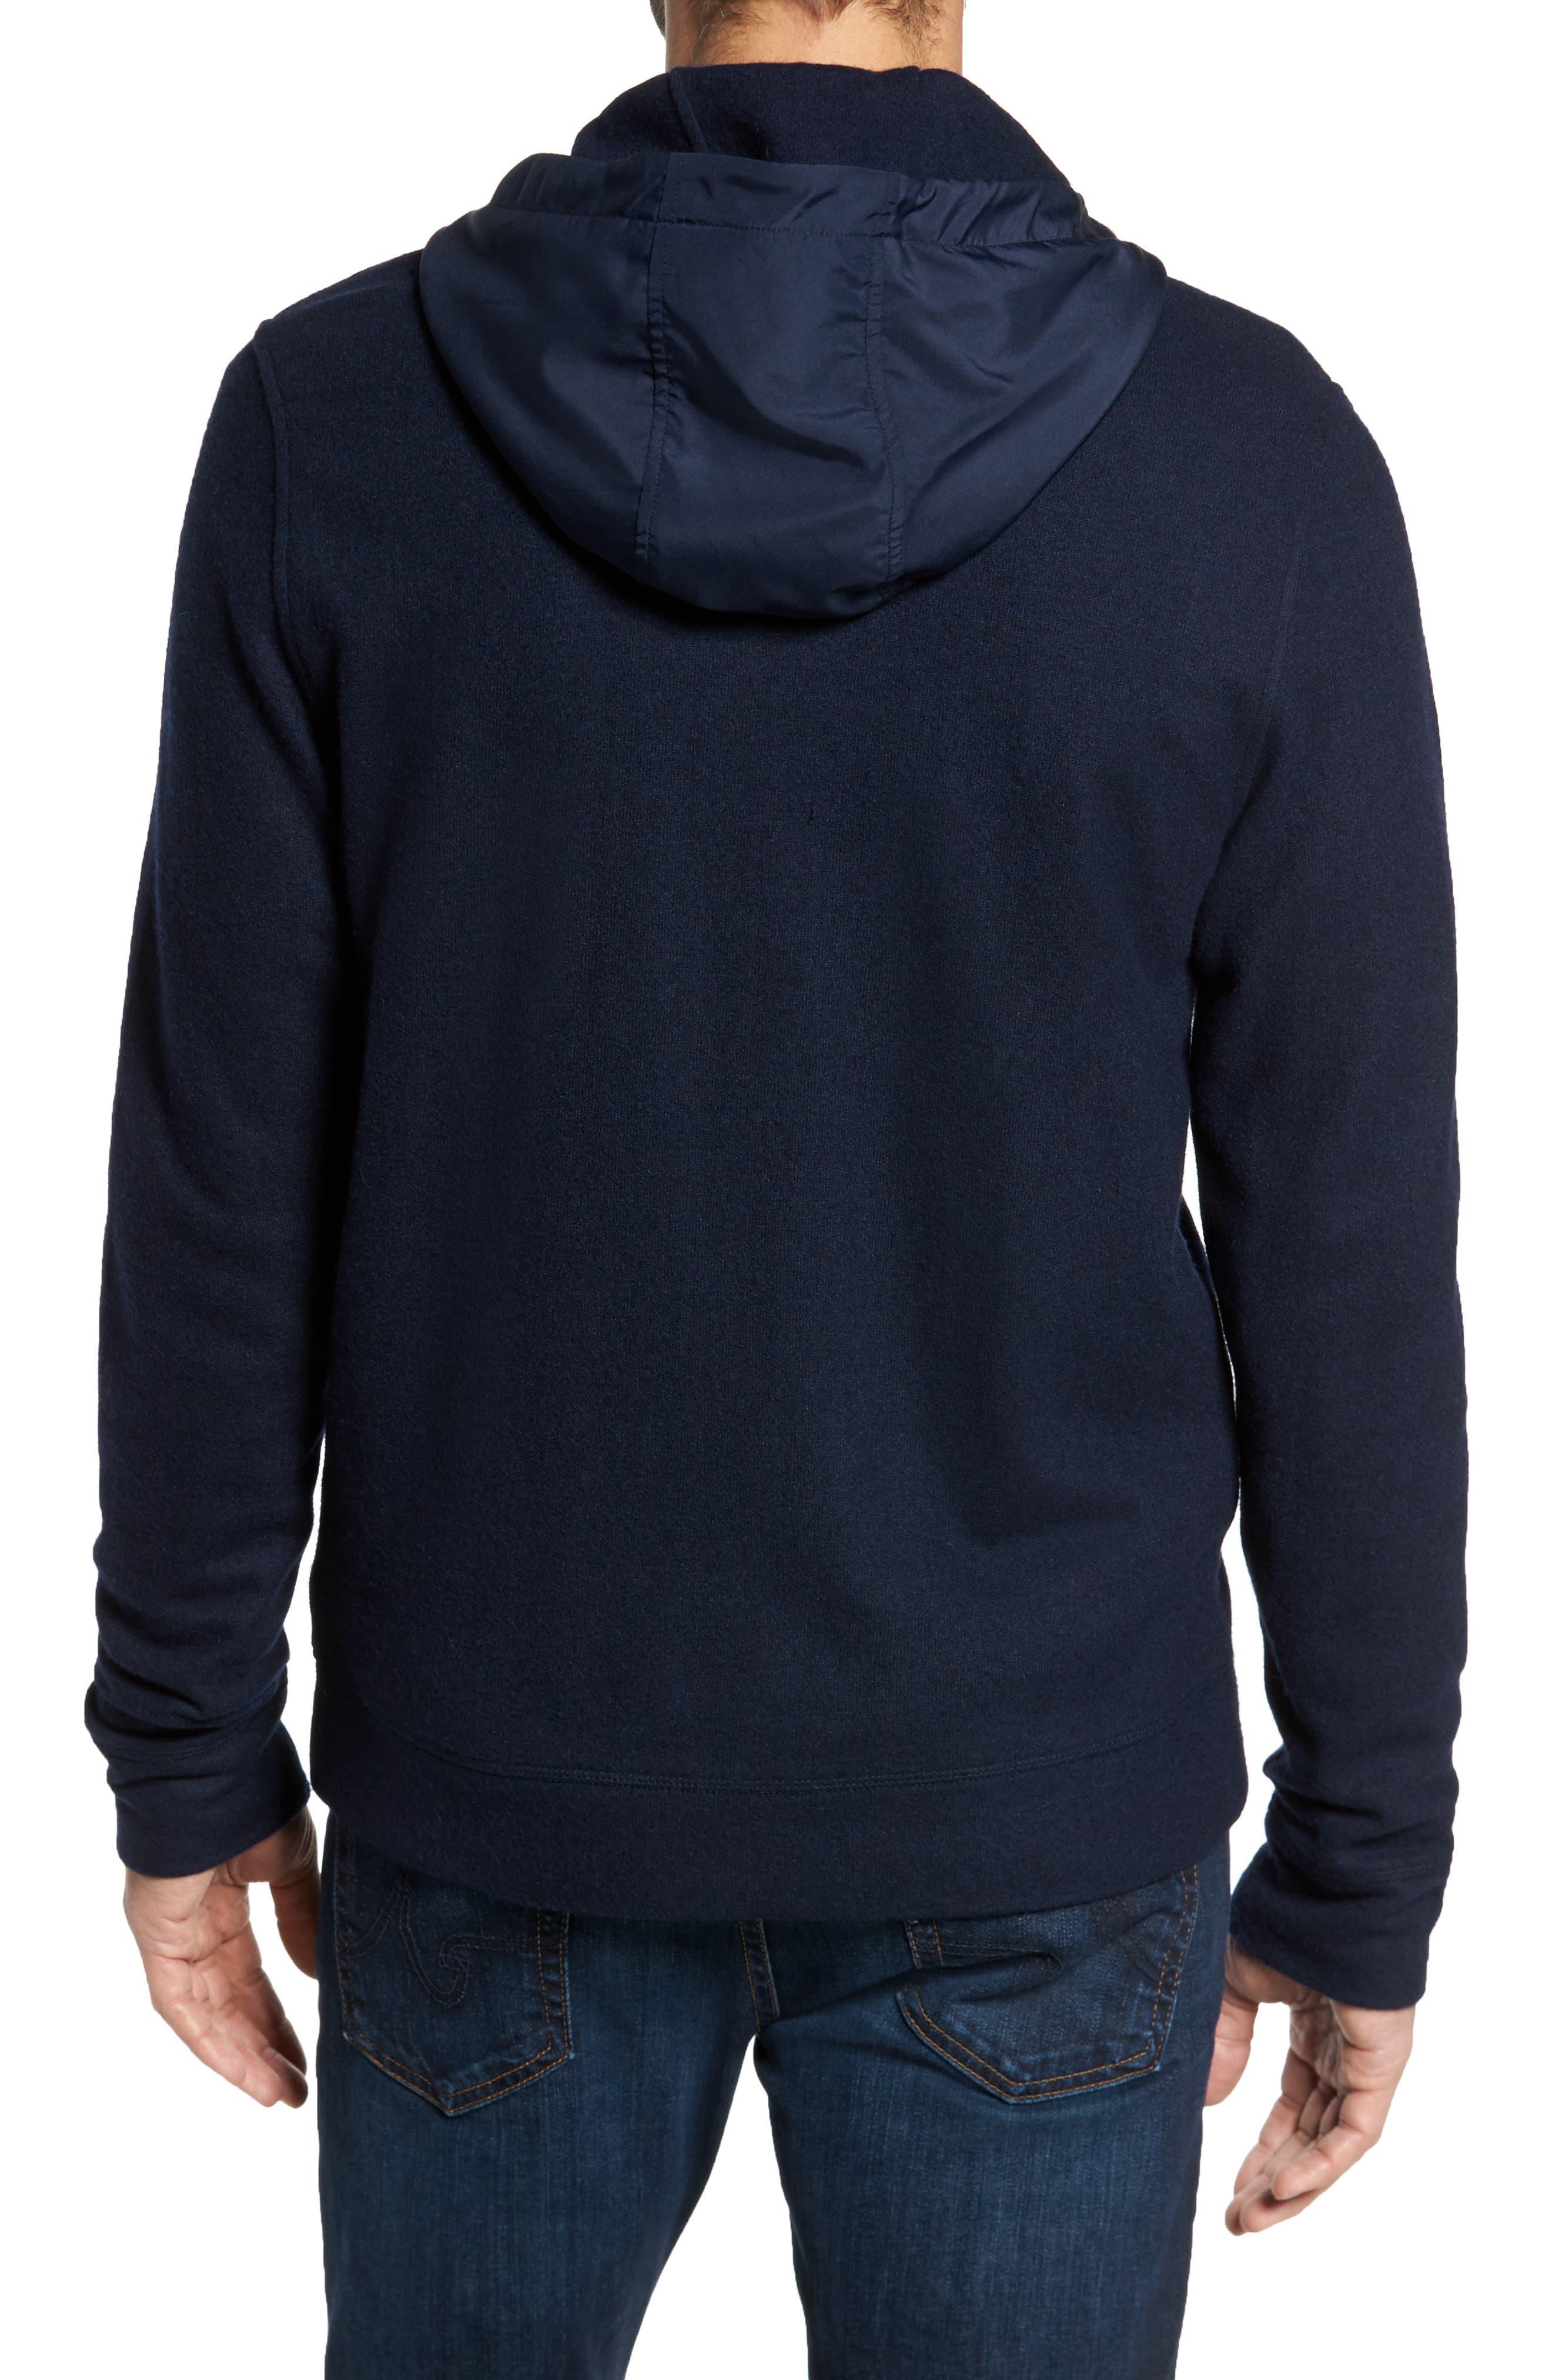 Wool Blend Hooded Cardigan,                             Alternate thumbnail 2, color,                             Navy Iris